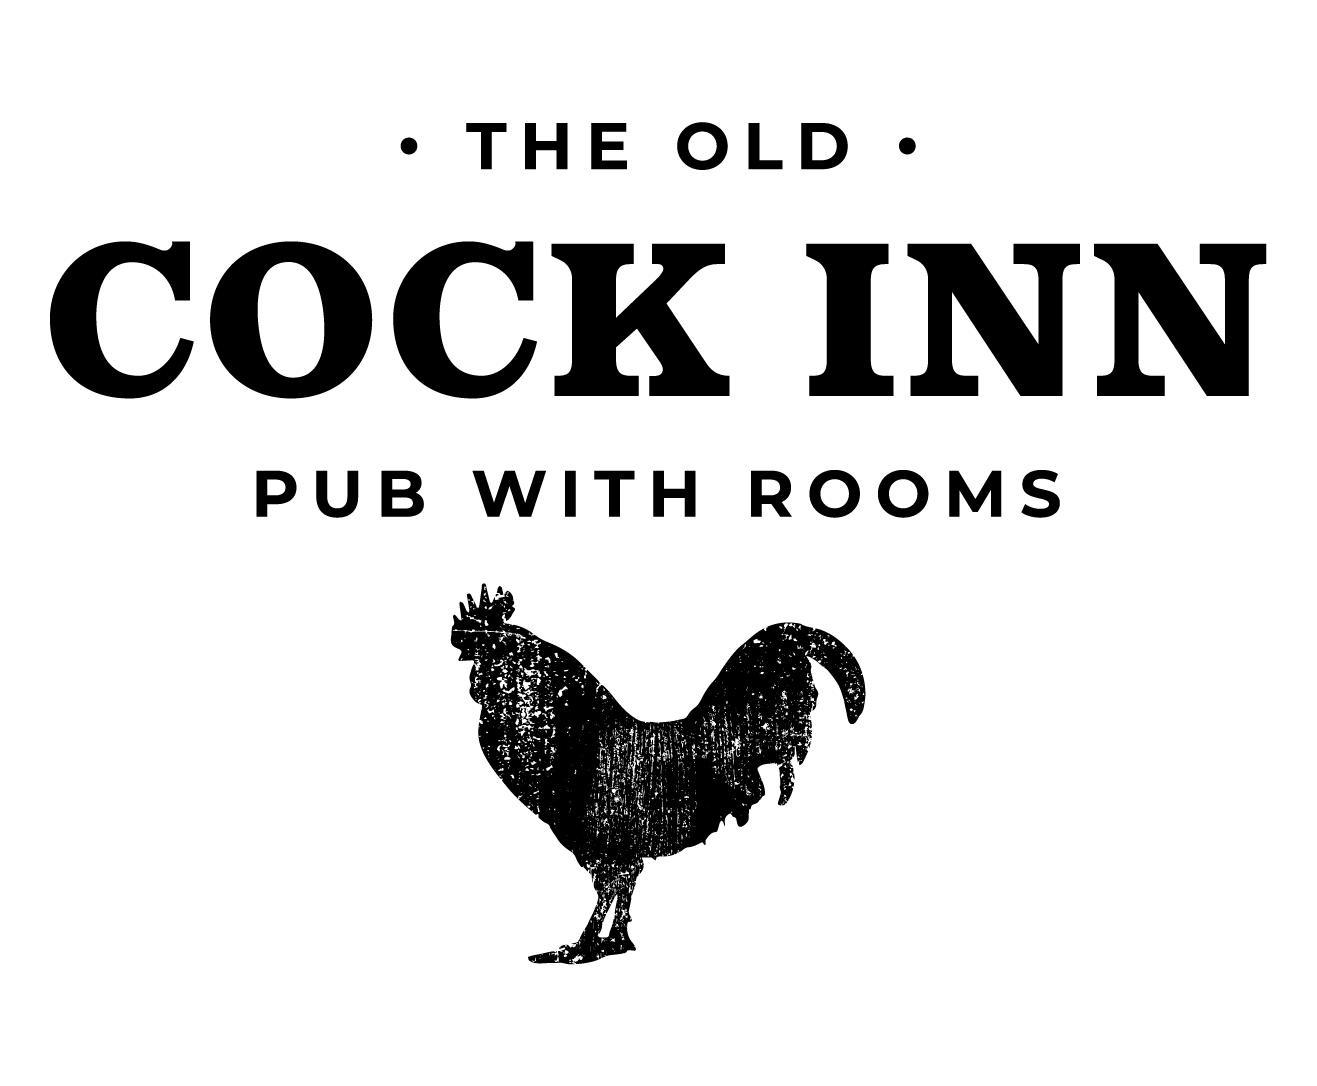 Cock inn potterspury